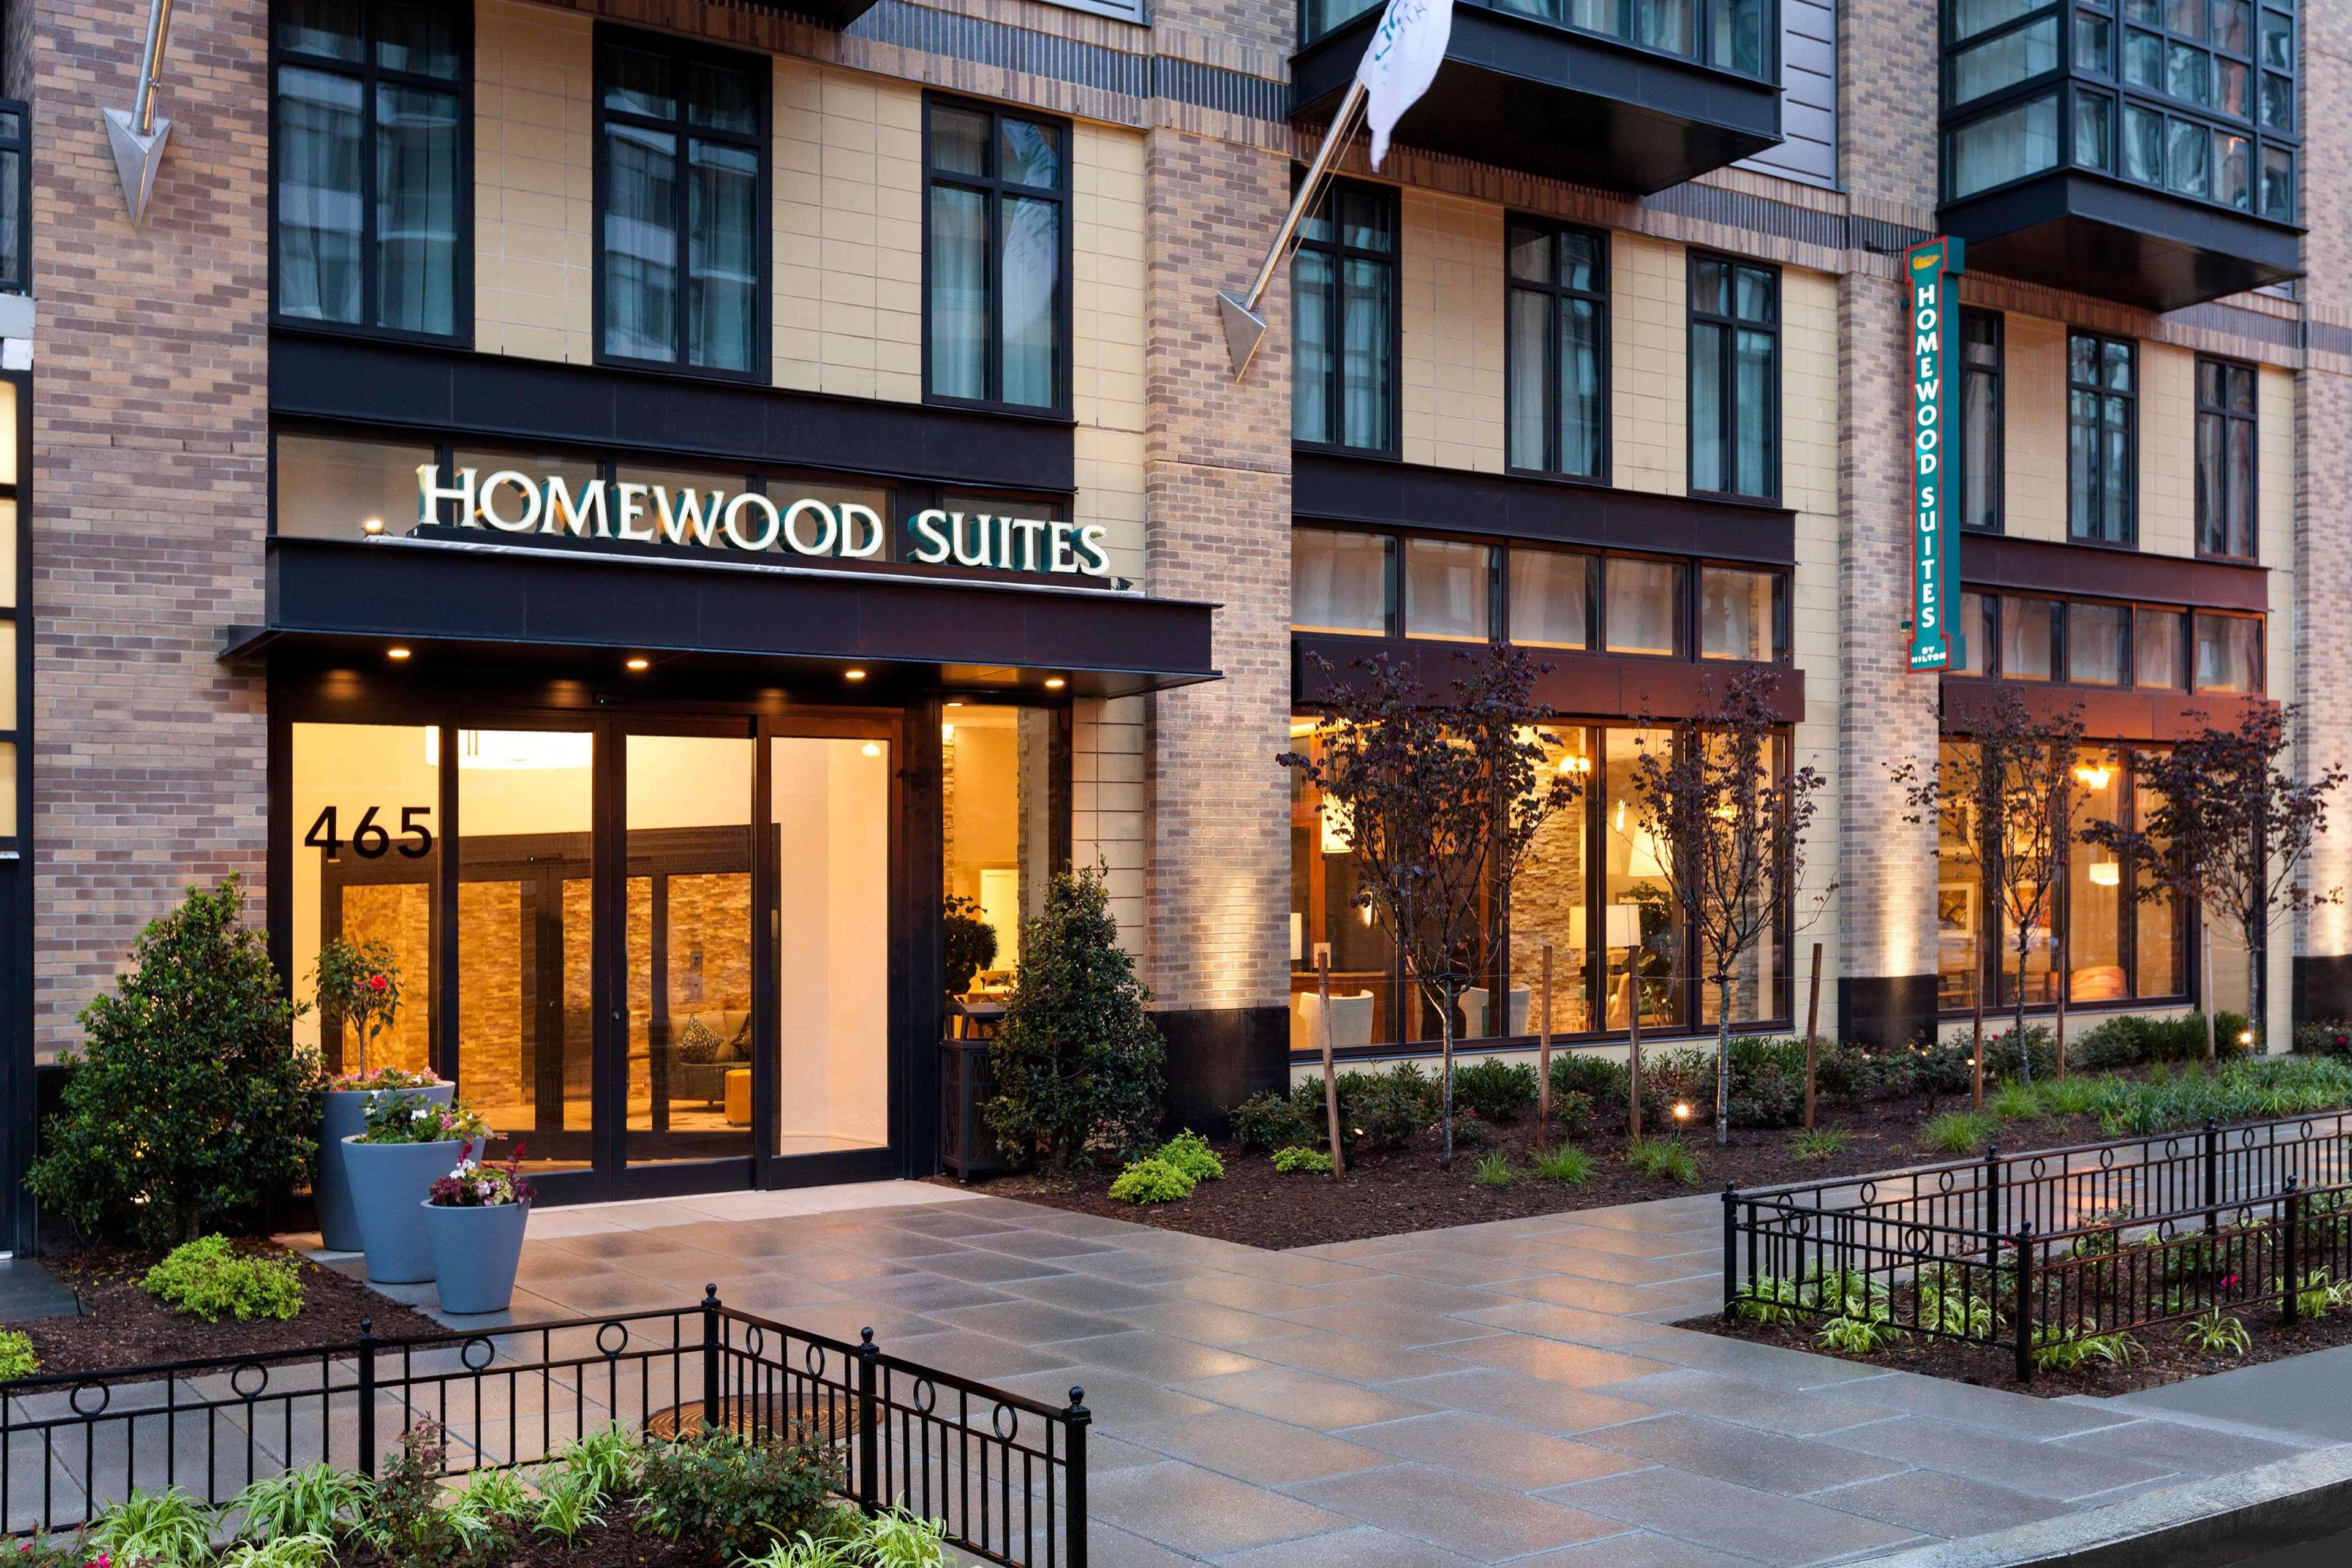 Homewood Suites by Hilton Washington DC Convention Center image 3